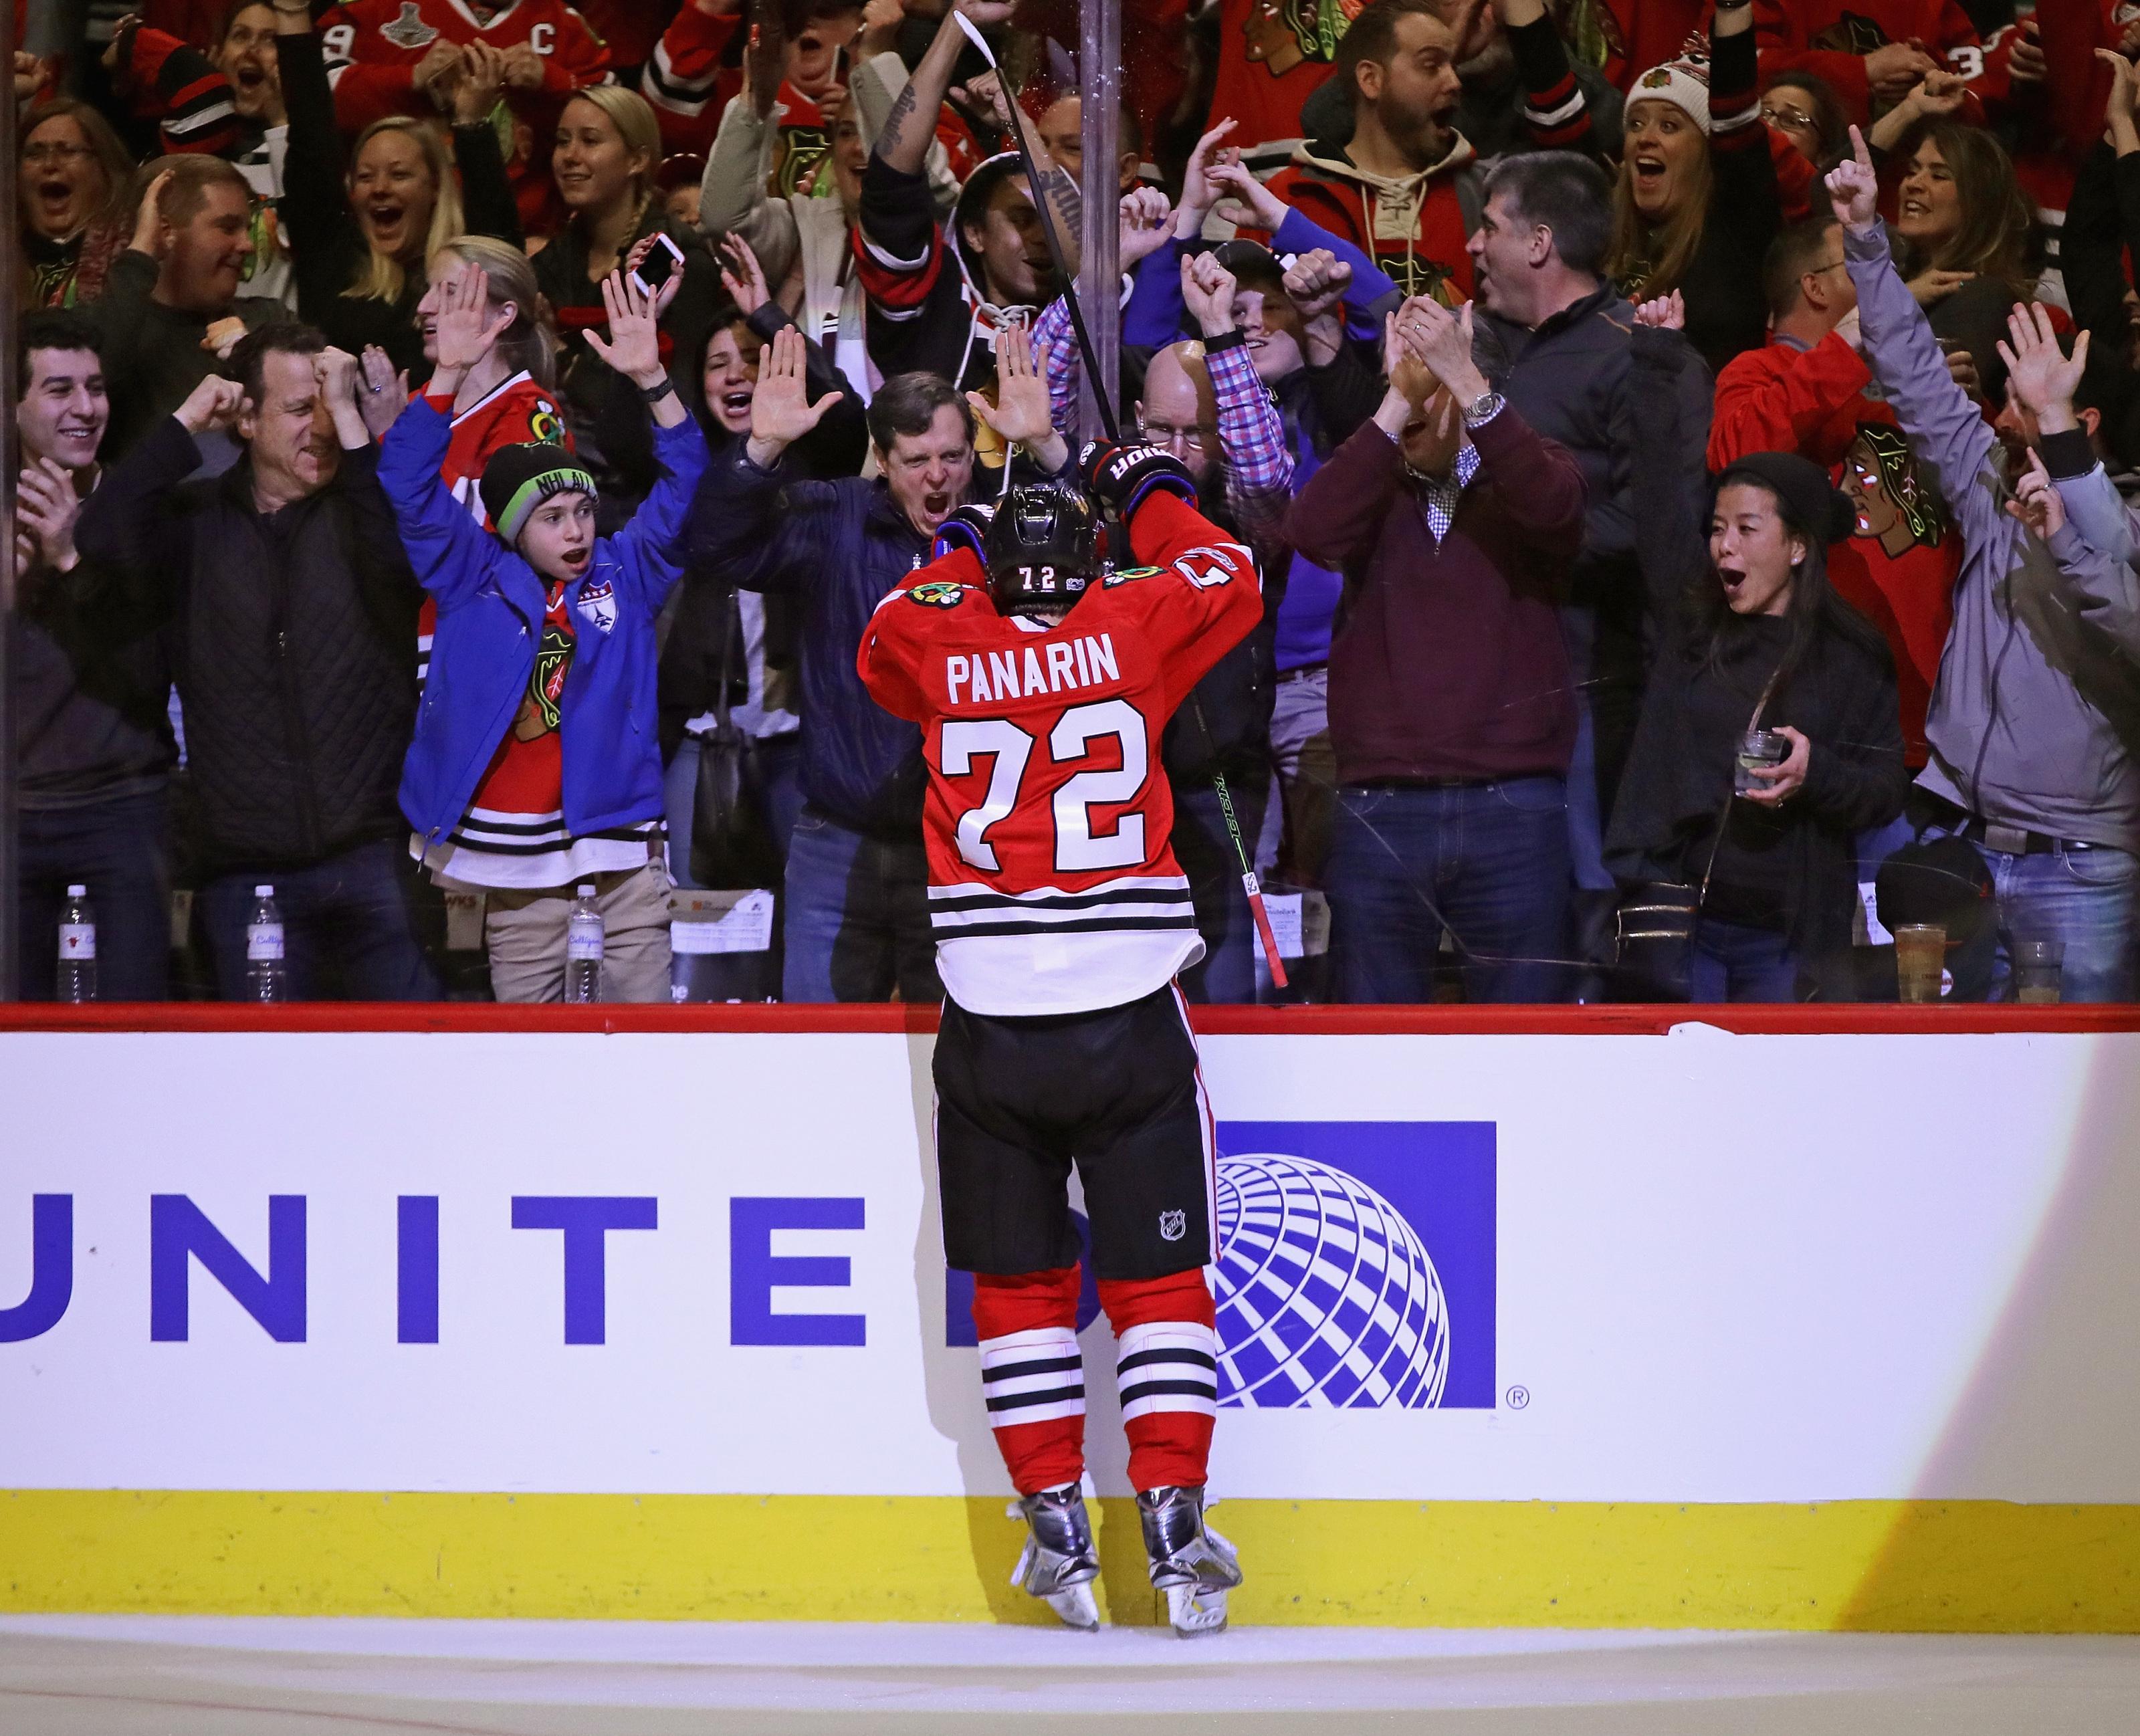 Chicago Blackhawks: Artemi Panarin returns to Chicago with NYR